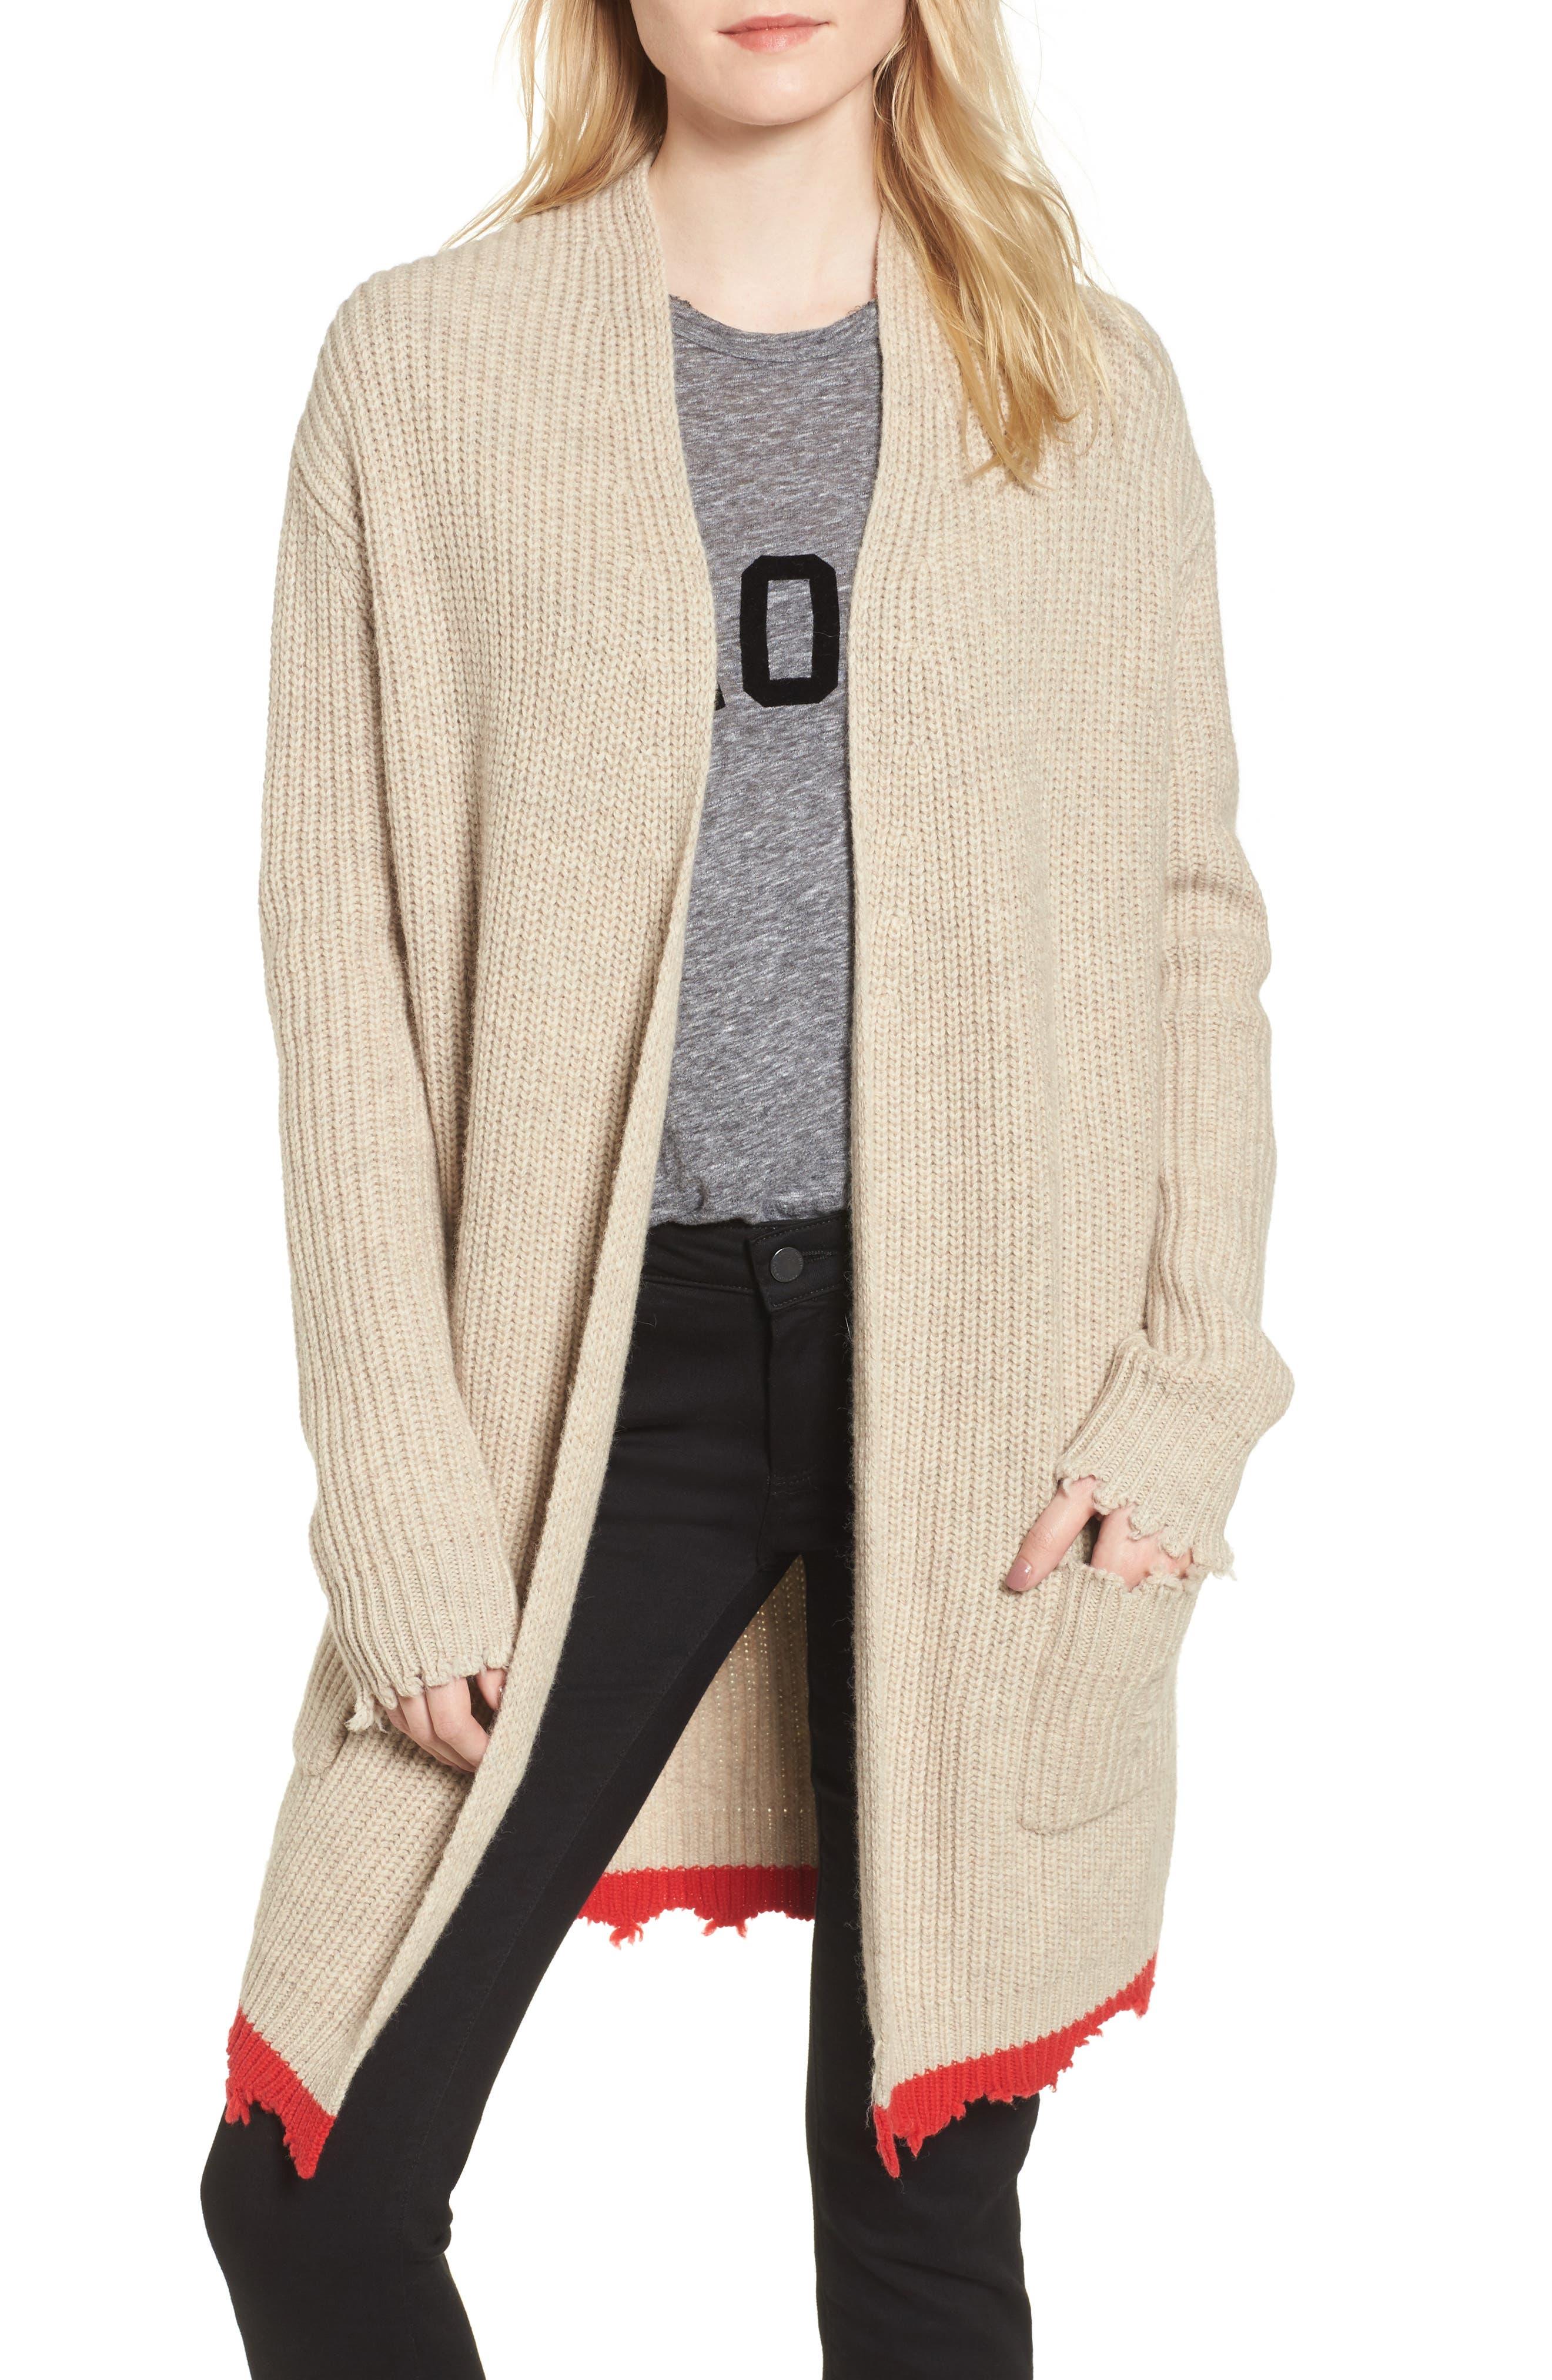 Main Image - Zadig & Voltaire Rita Cardigan Sweater